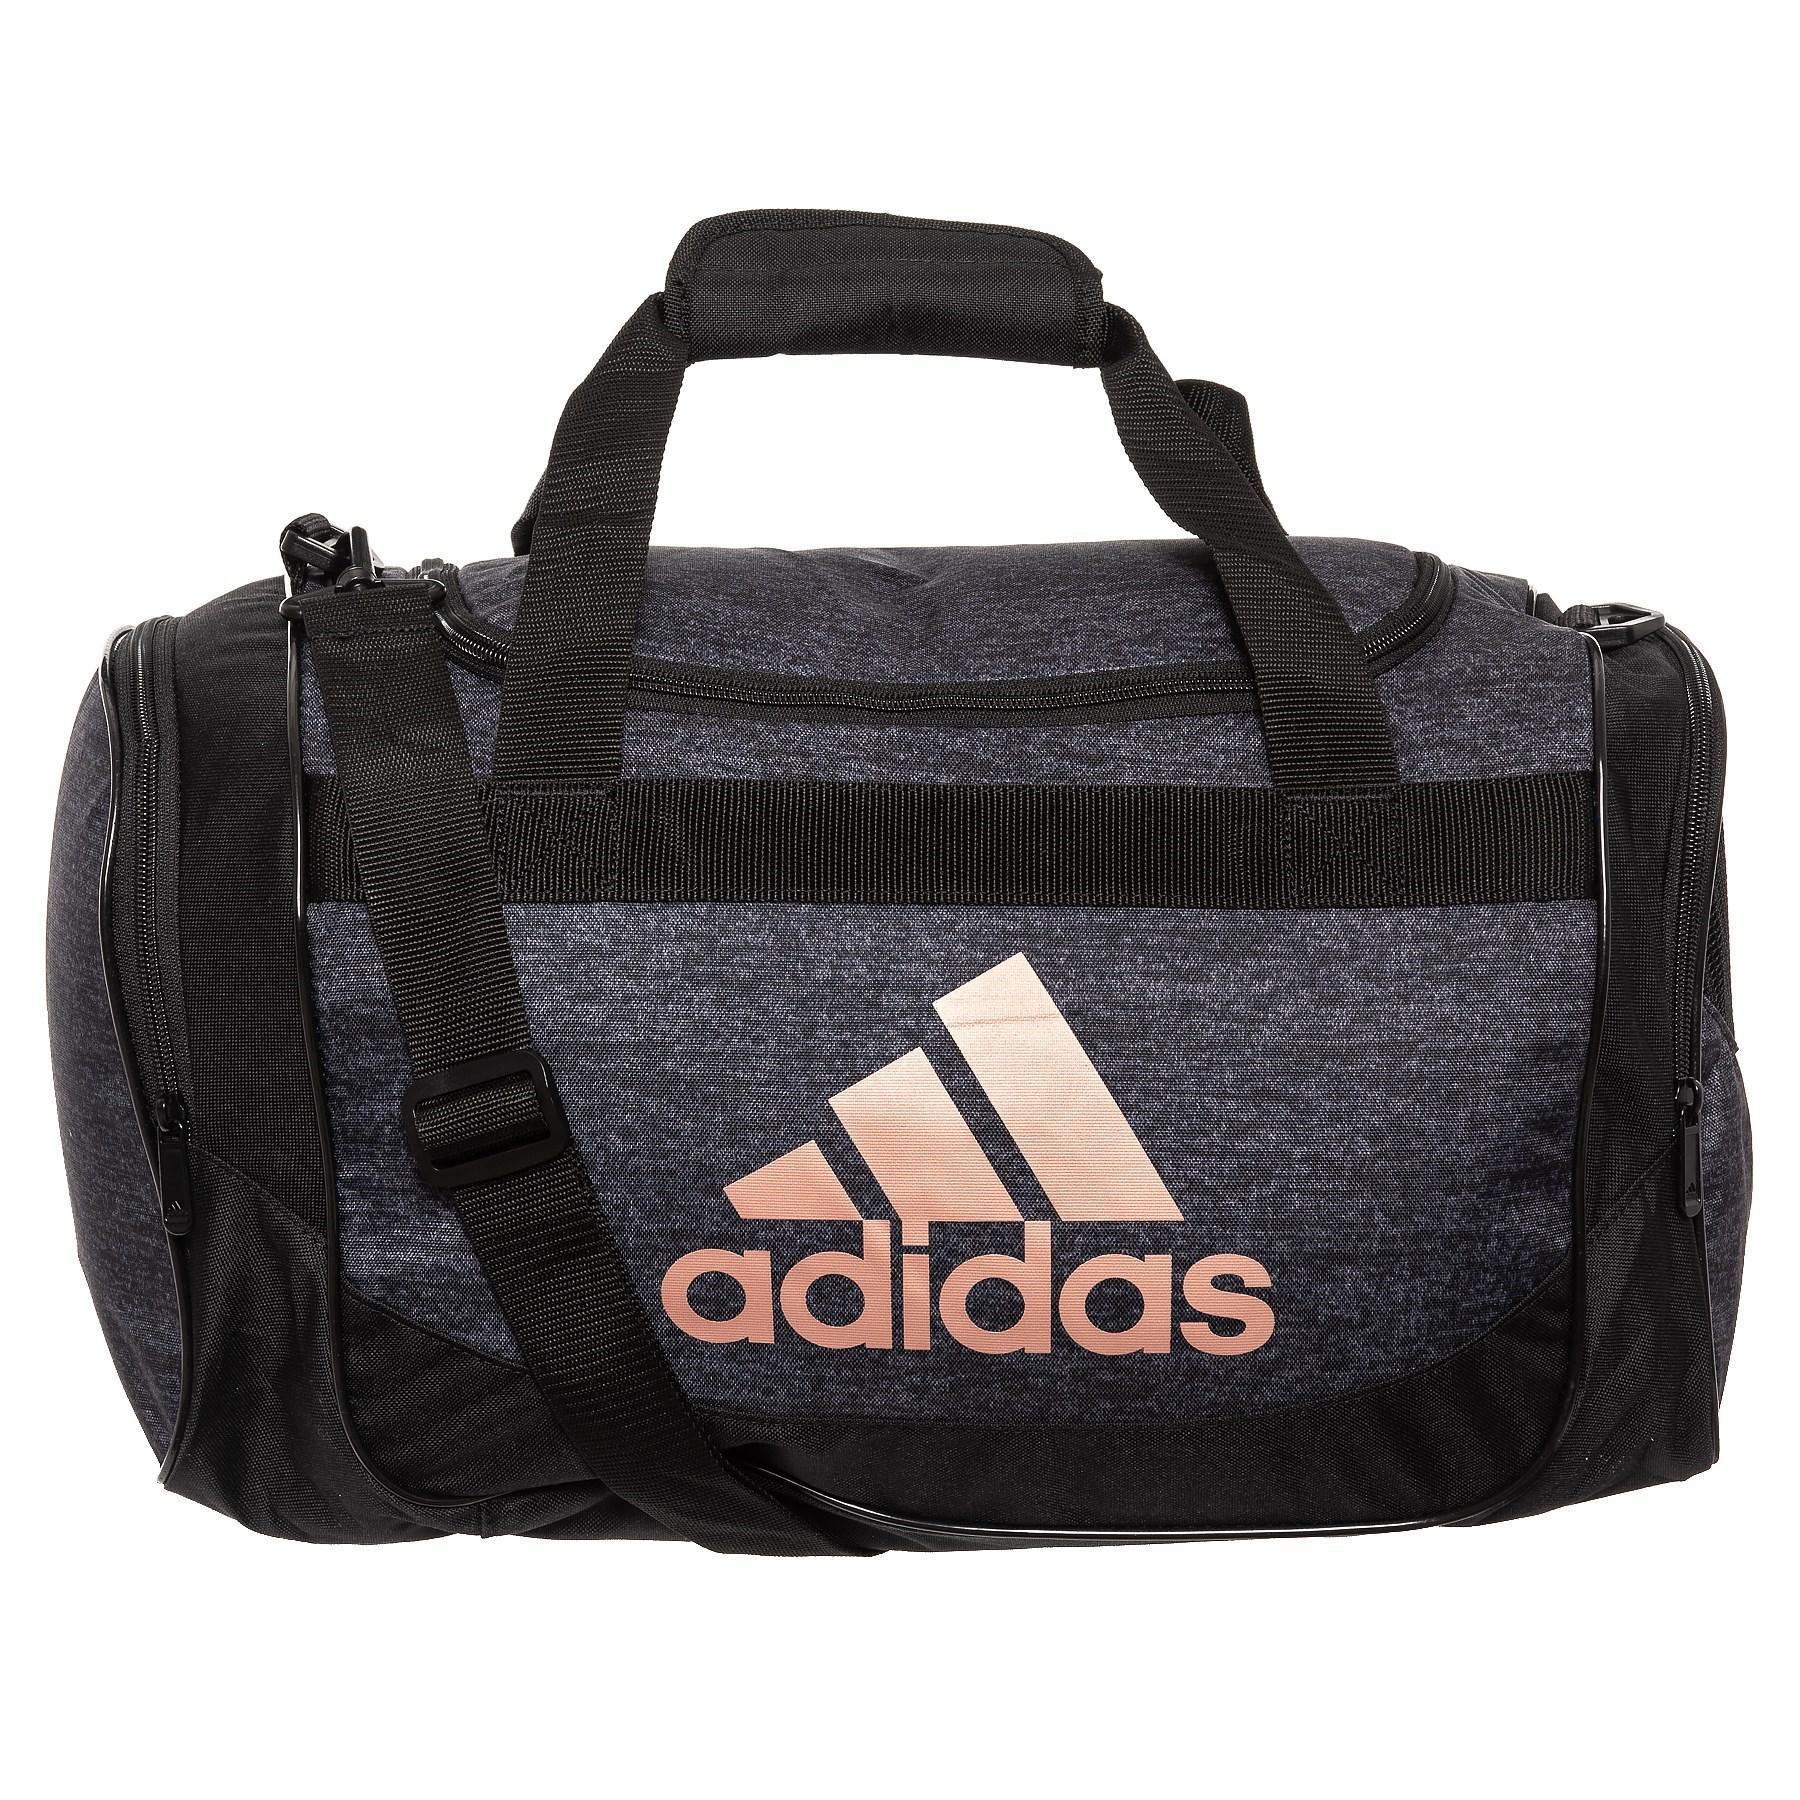 Adidas - Black Defense Duffel Bag for Men - Lyst. View fullscreen b37a5617f86e6